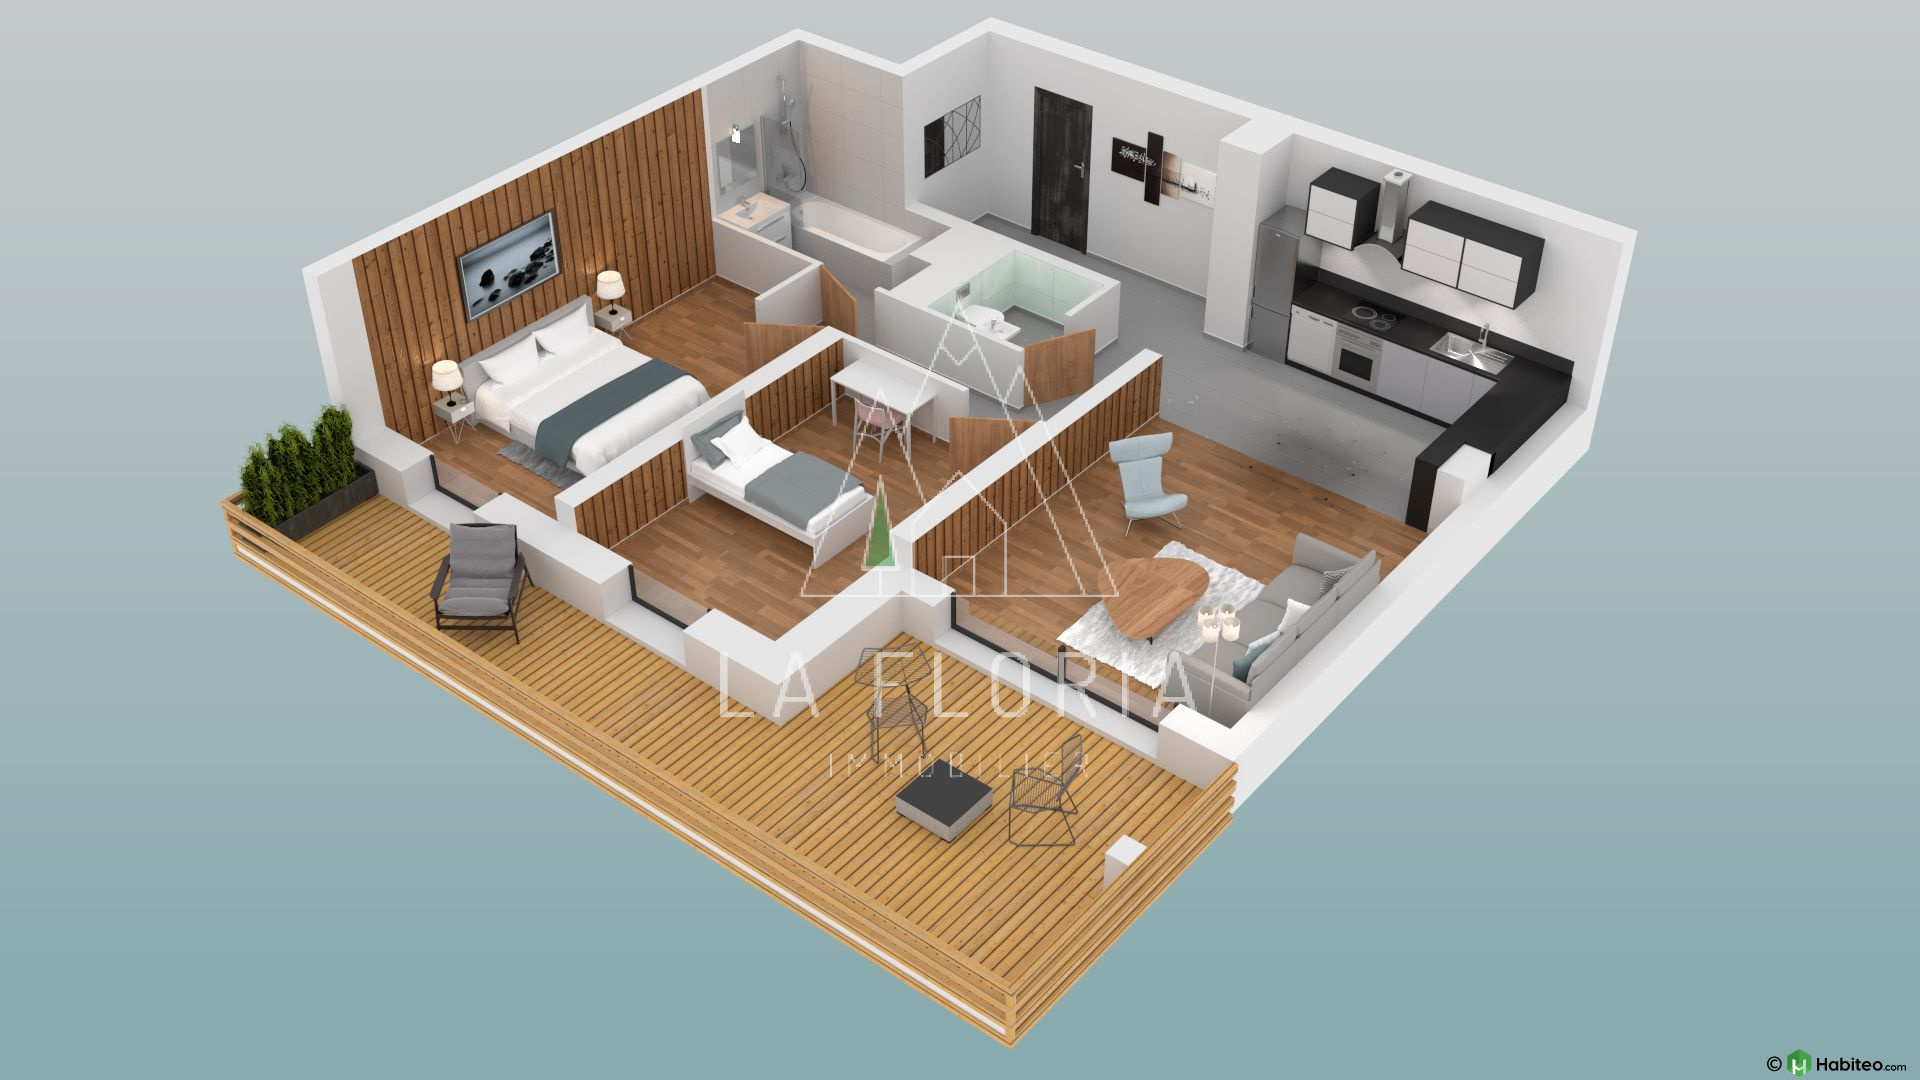 UNDER OFFER / 2 BEDROOM 63 M2 APARTMENT IN NEW LUXURY DEVELOPMENT, CHAMONIX LES PRAZ